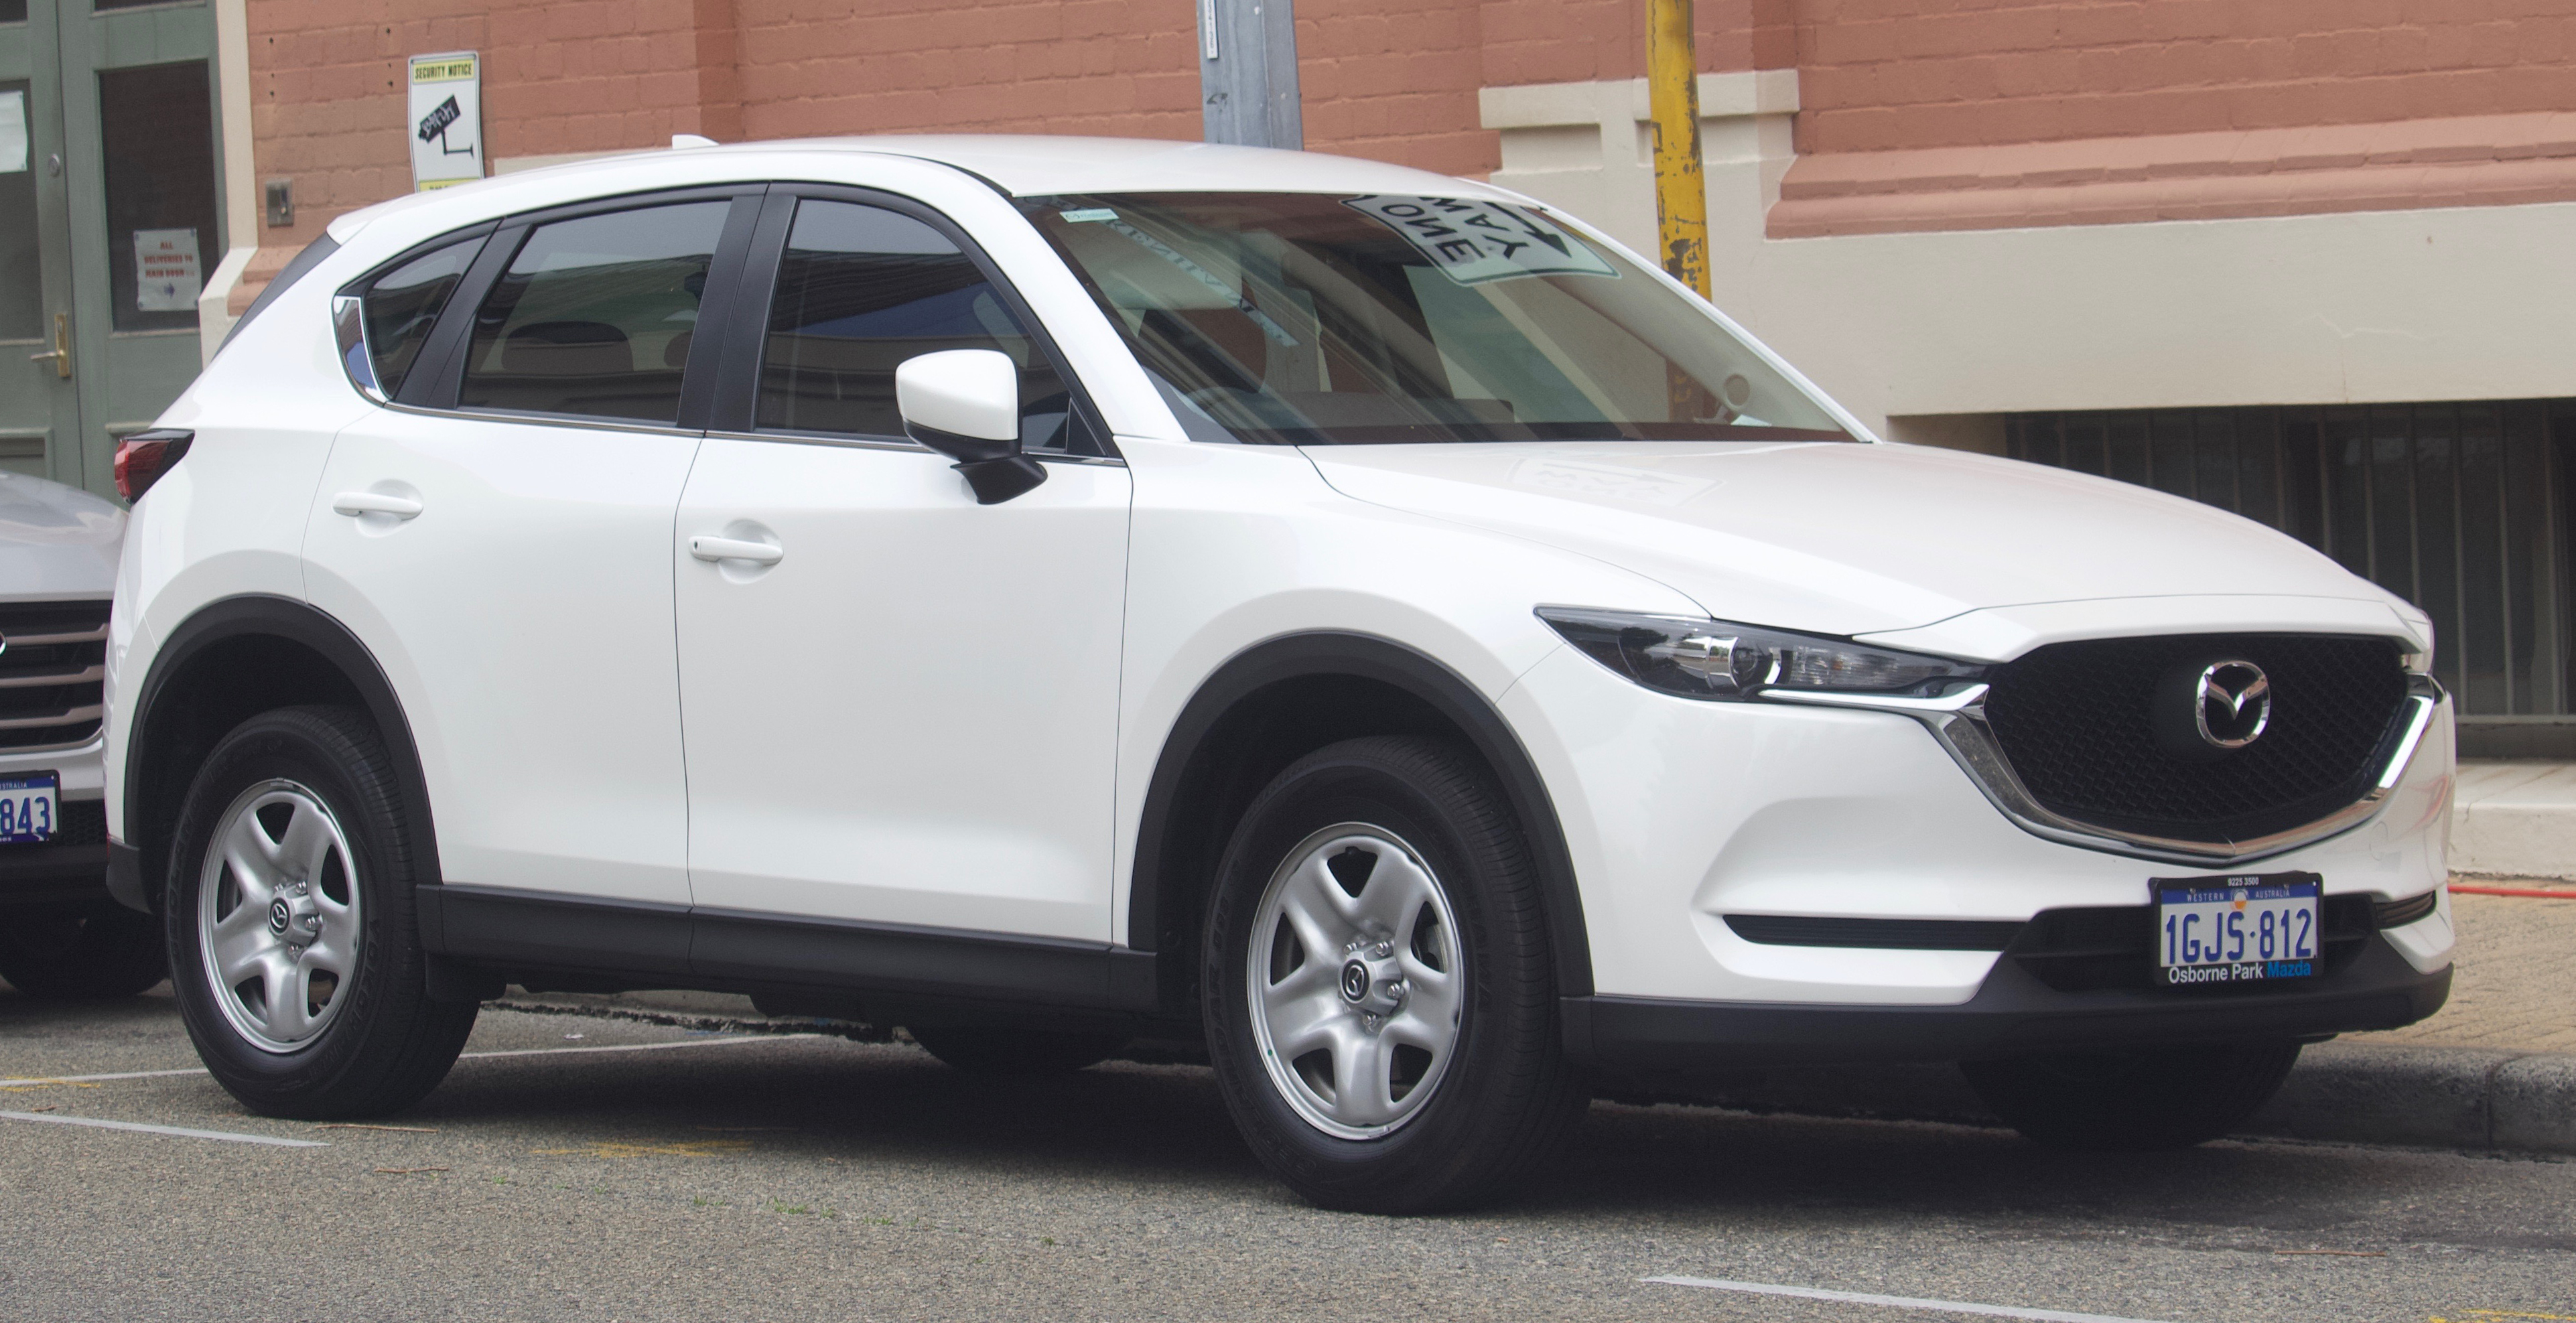 datei:2017 mazda cx-5 (kf) maxx 2wd wagon (2018-11-02) 01